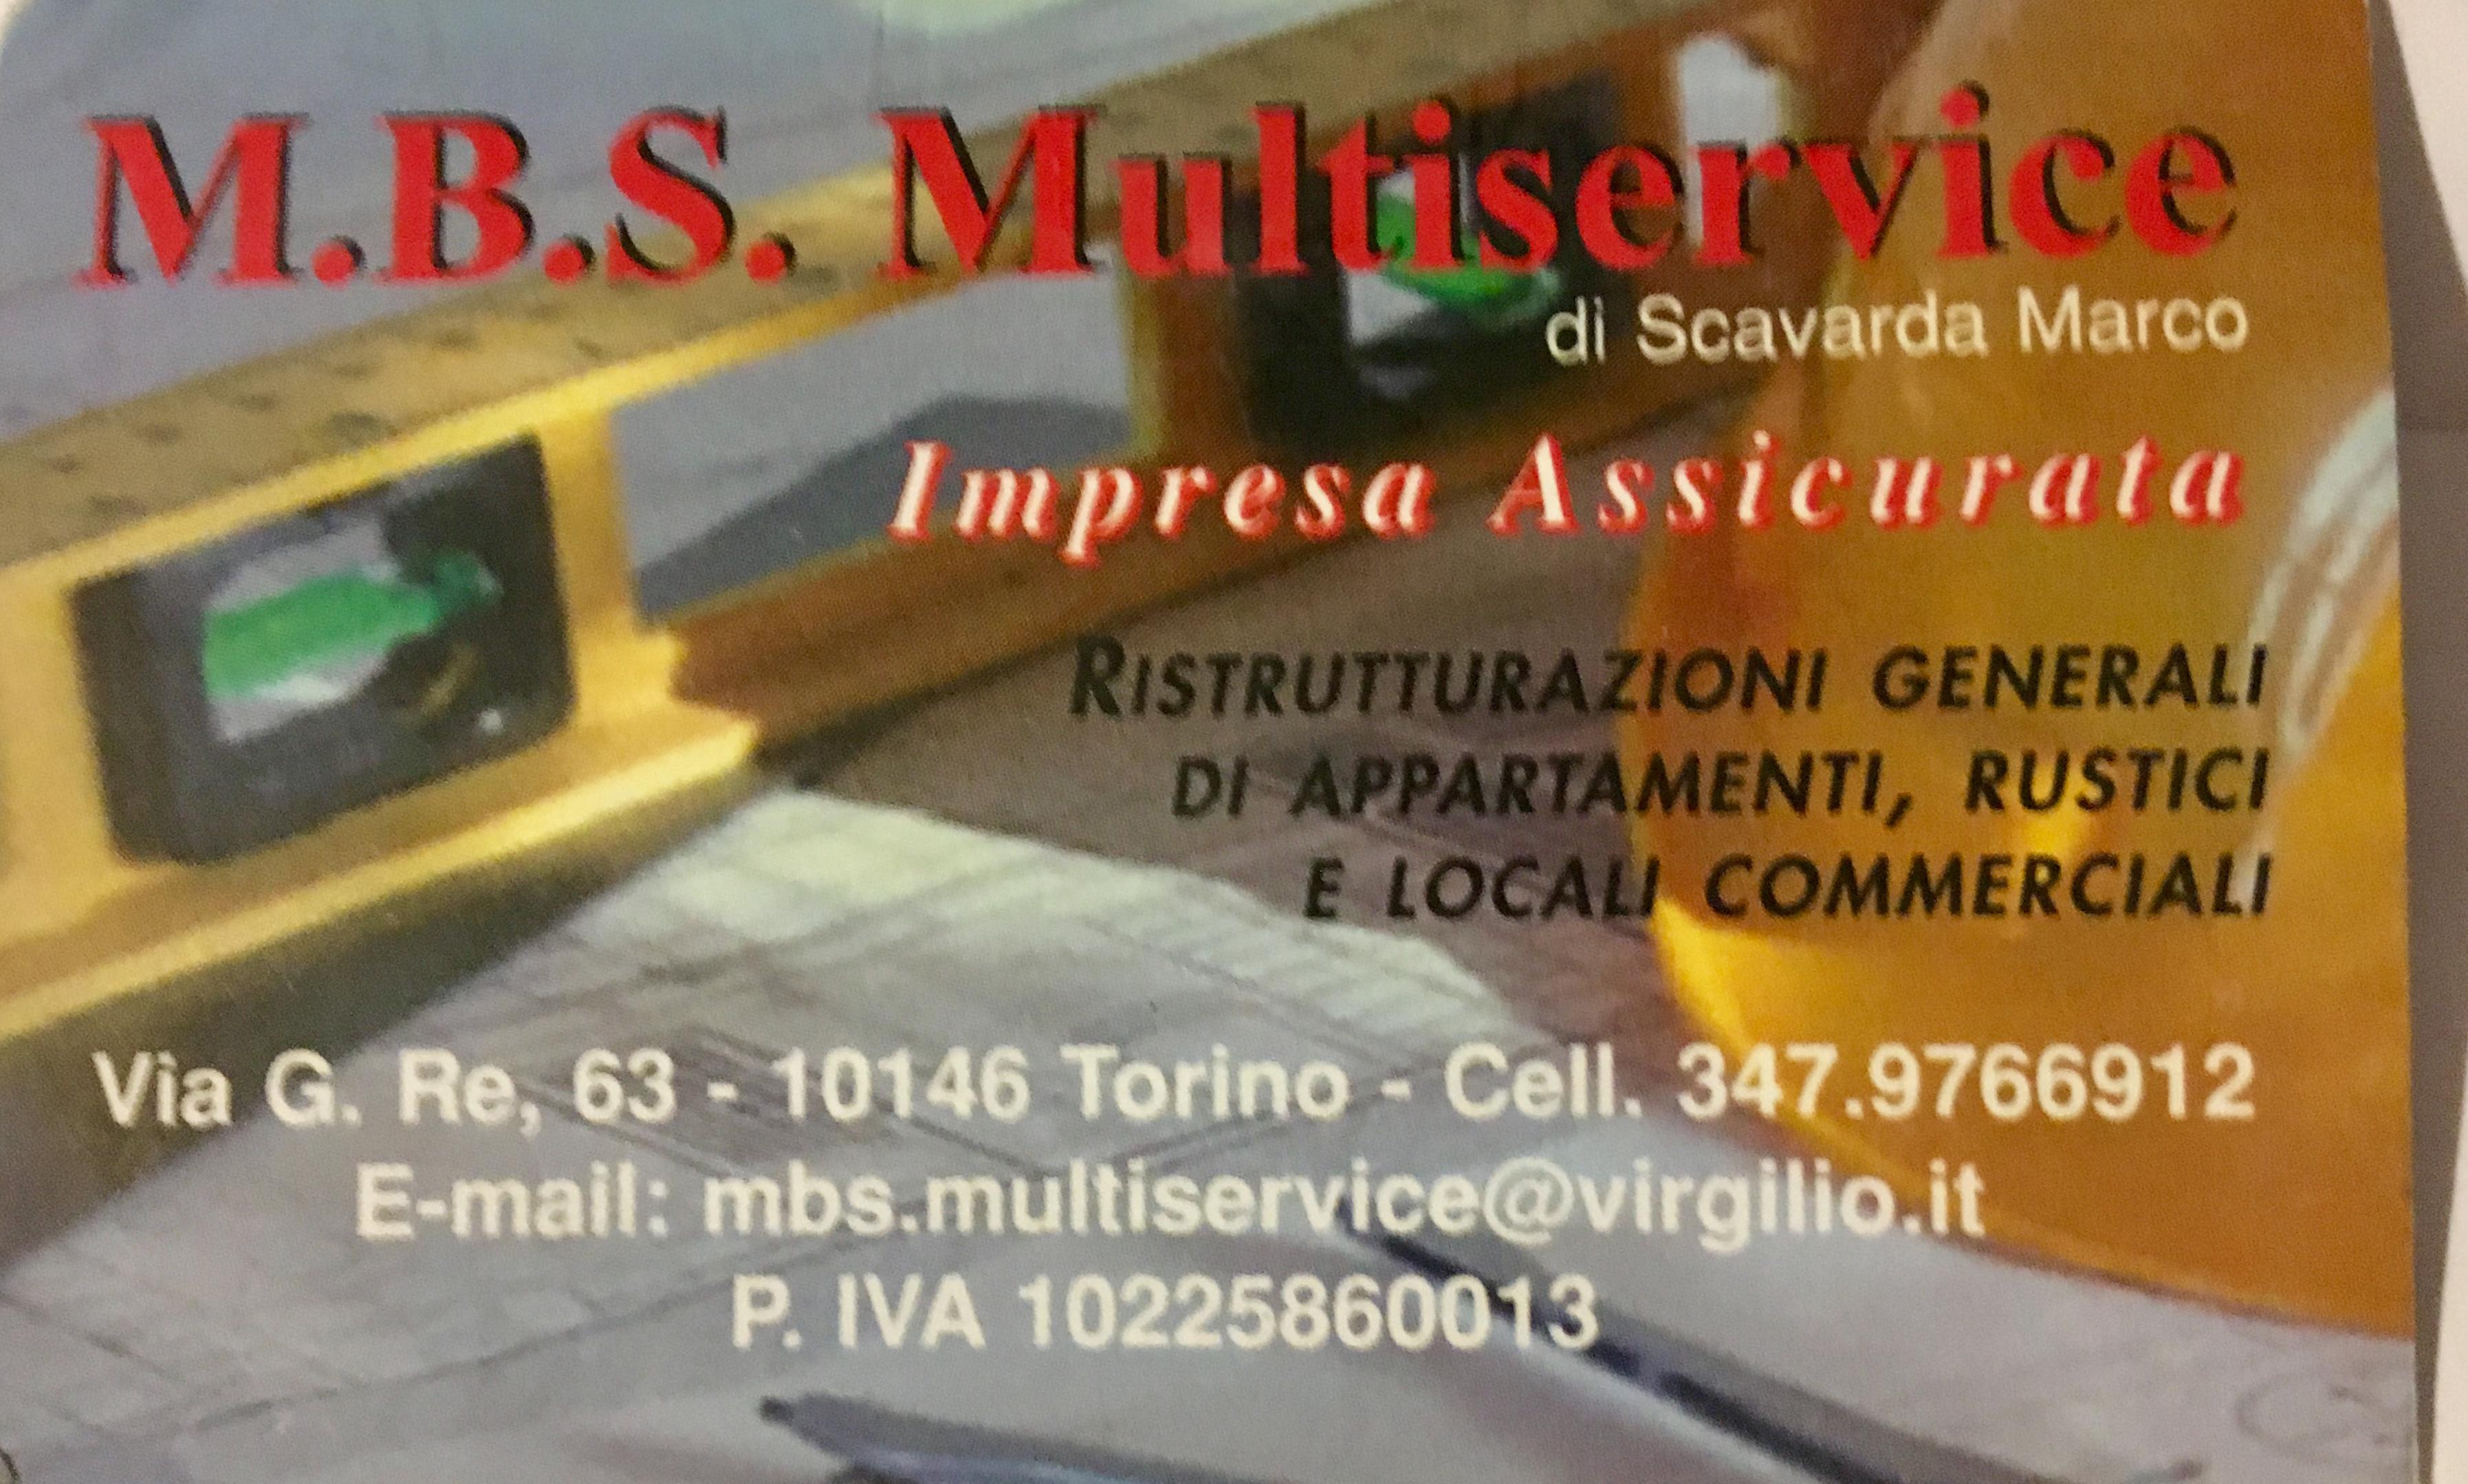 M.b.s.multiservice